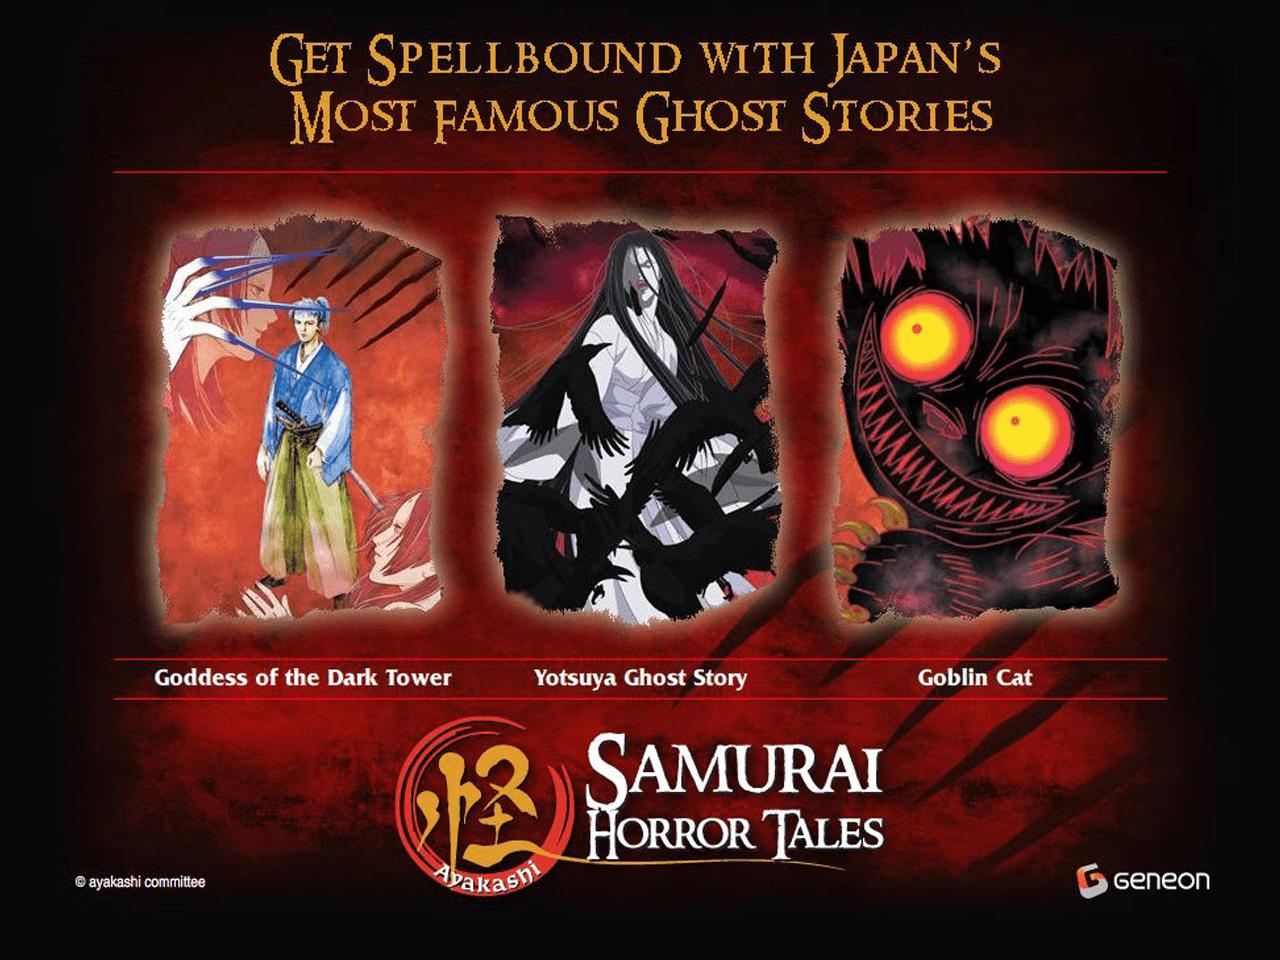 Samurai Horror Tales